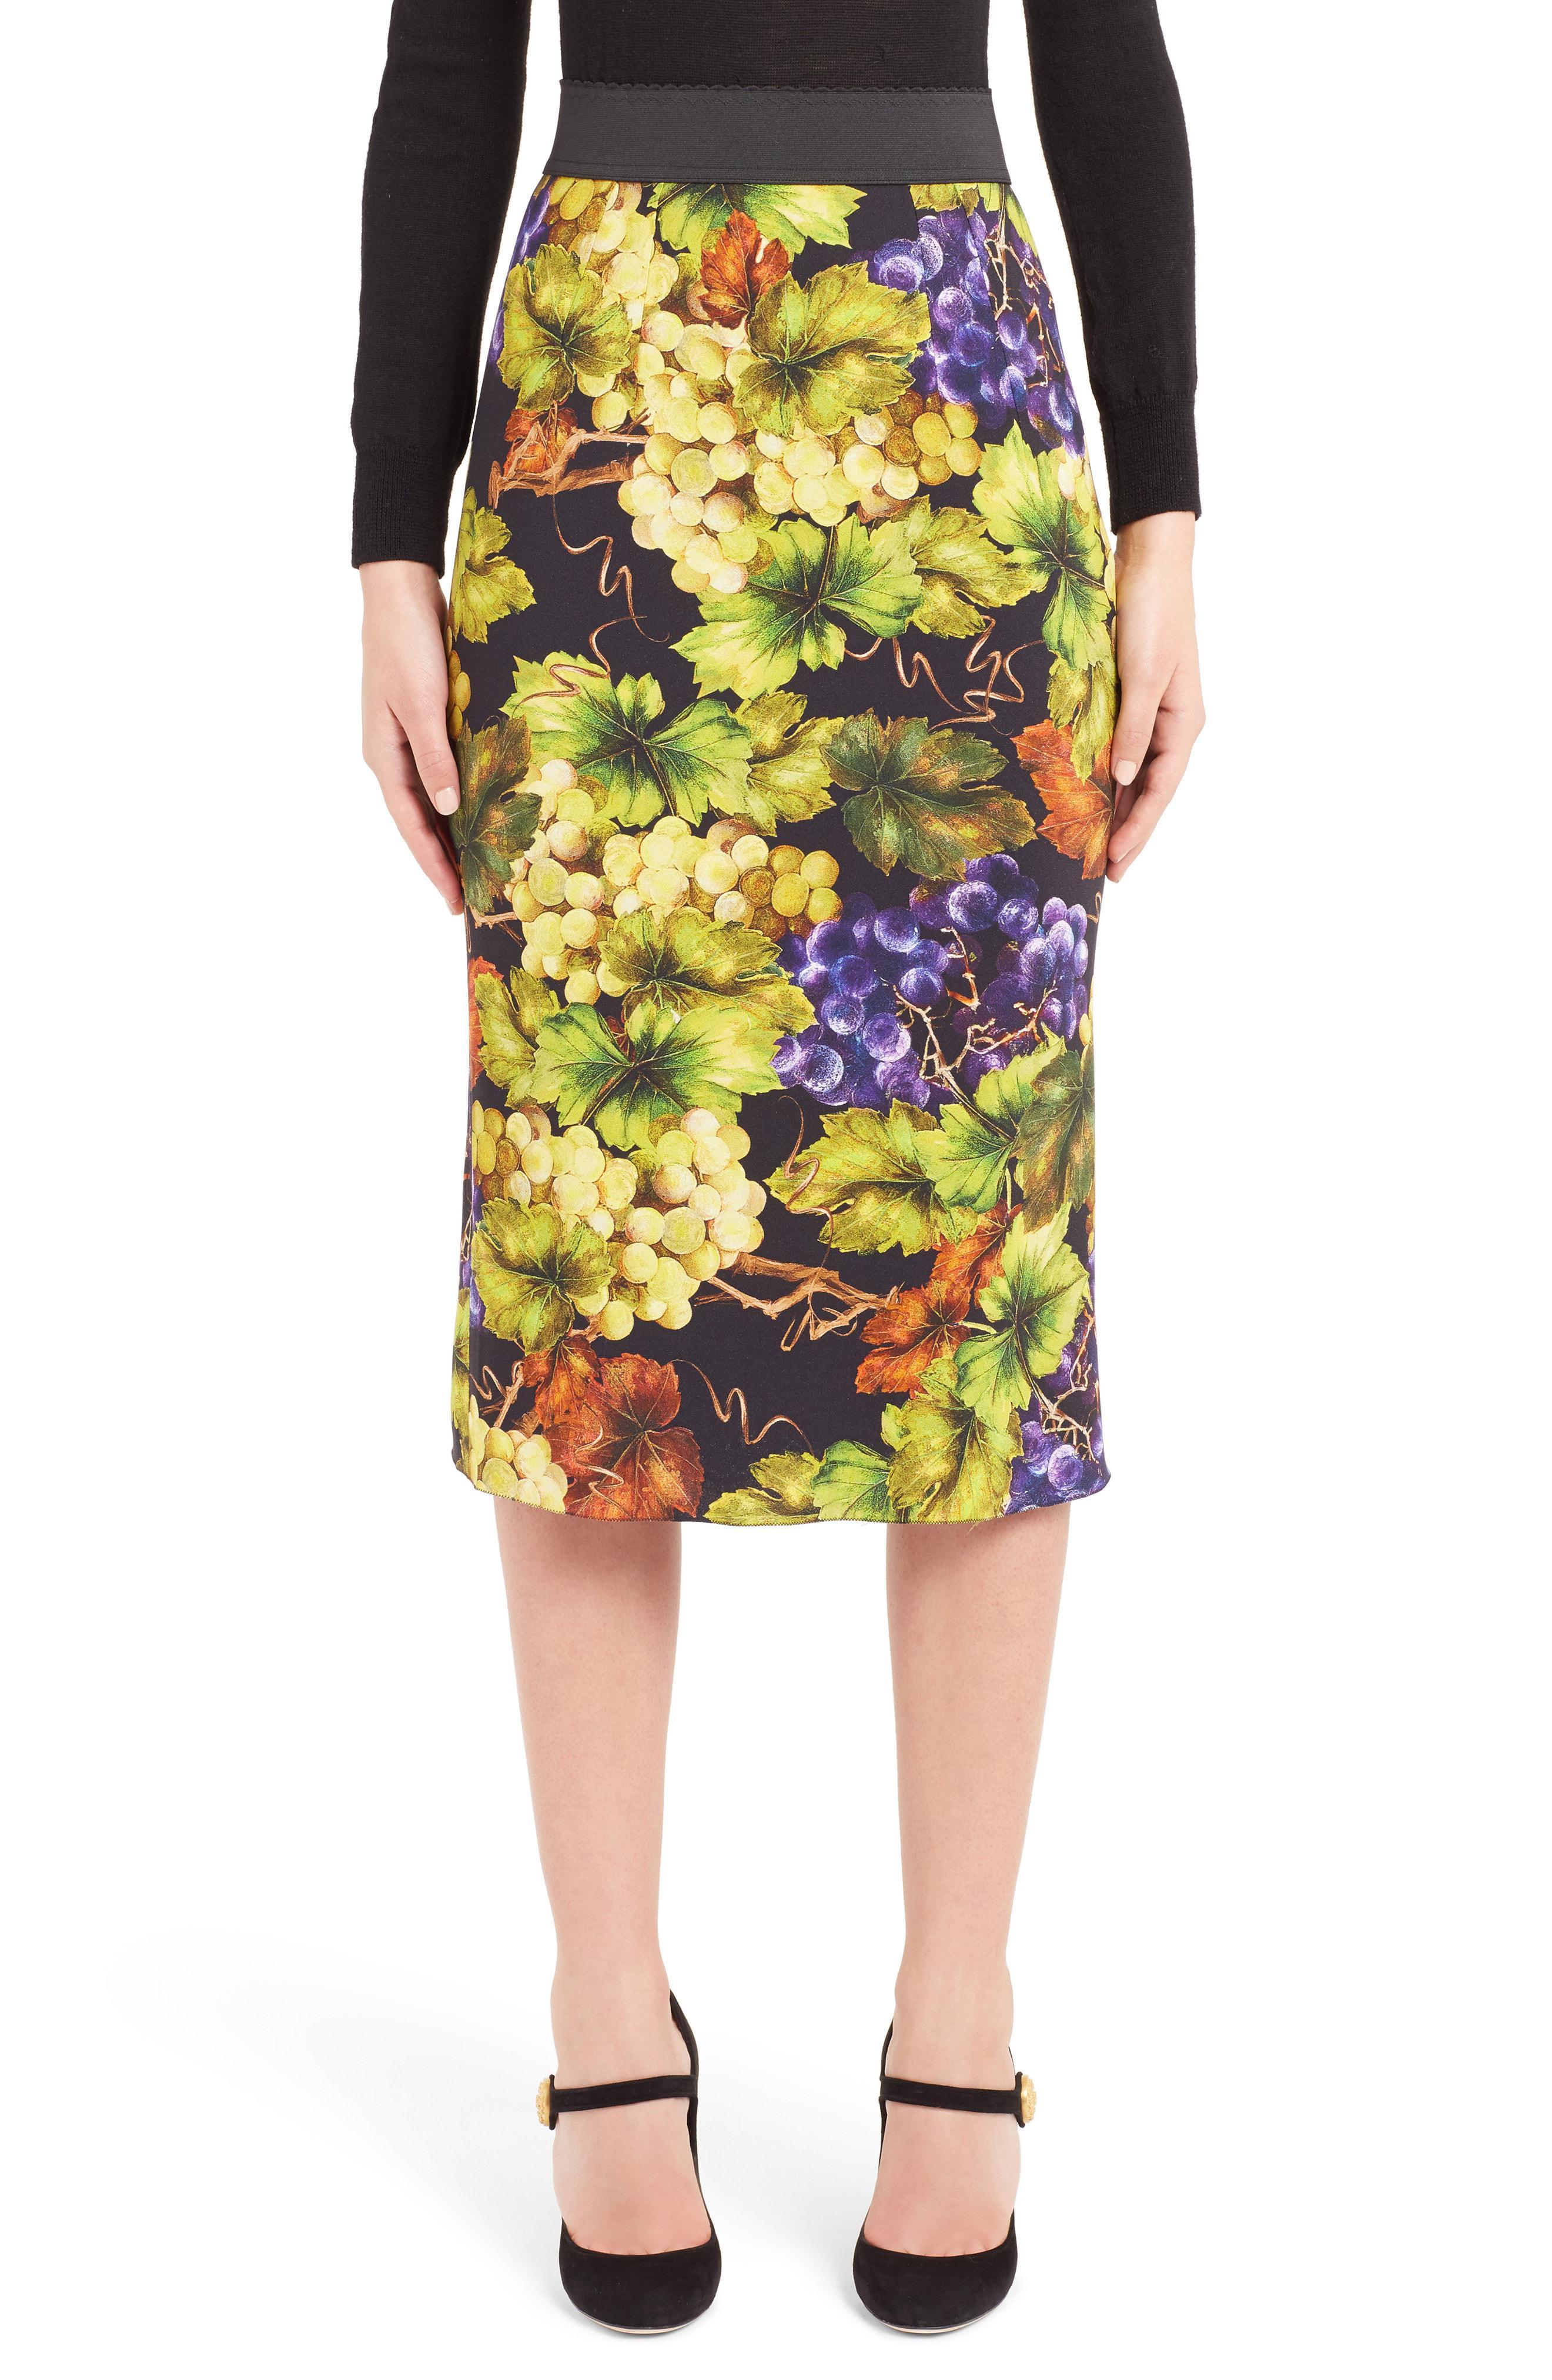 1b15d91e32 Dolce & Gabbana Grape Print Pencil Skirt in Black - Lyst